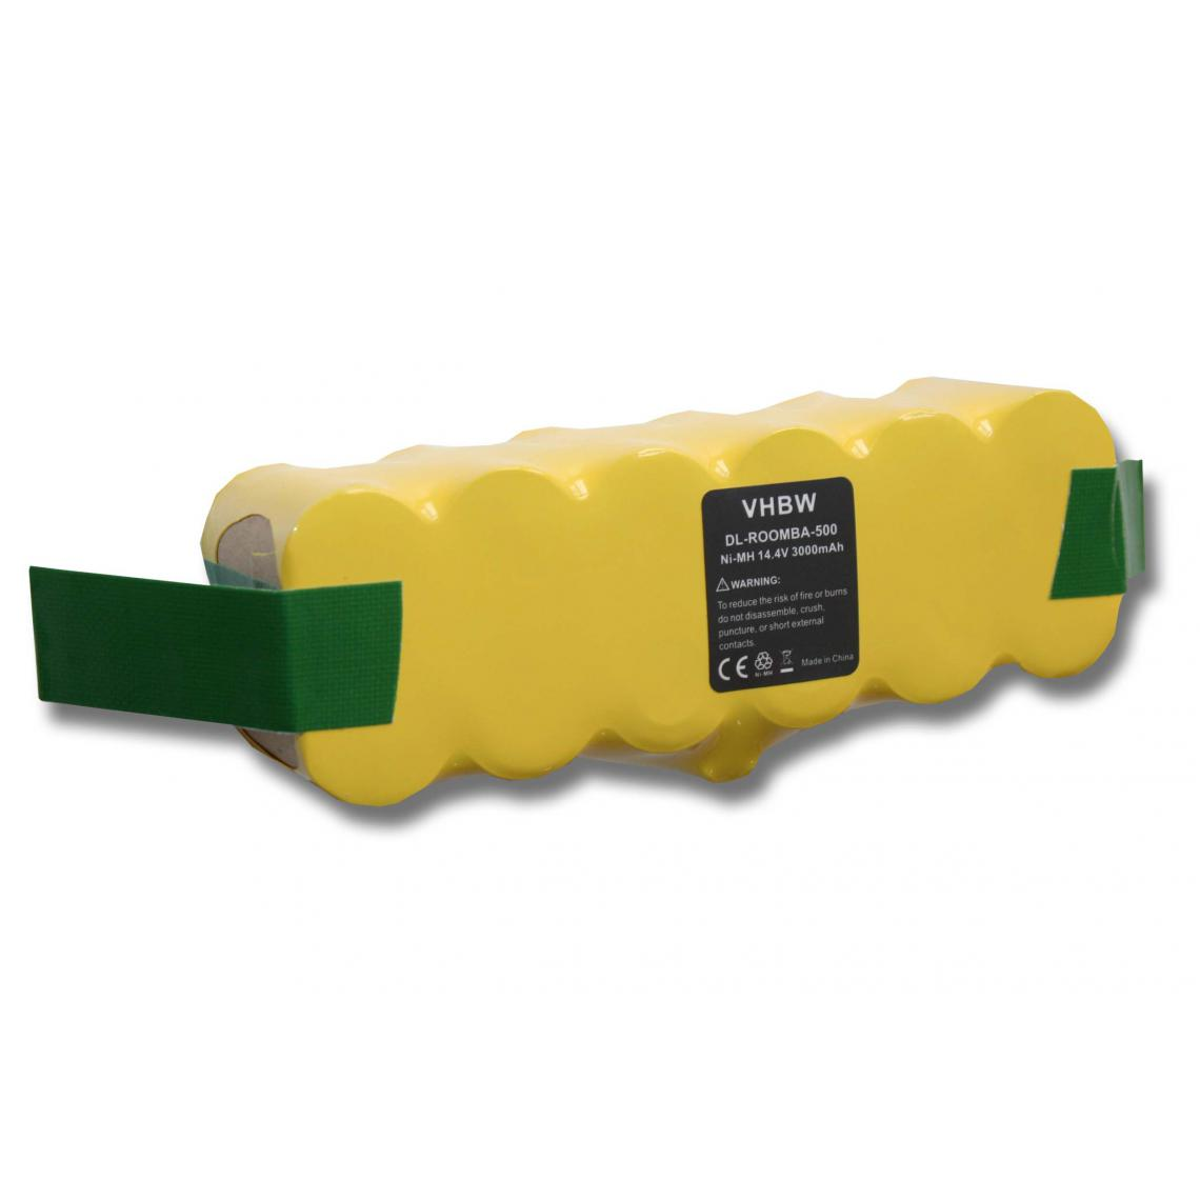 Vhbw vhbw batterie de rechange compatible avec iRobot Roomba séries 500, 600, 700, 800, 900 aspirateur - (NiMH, 3000mAh, 14.4